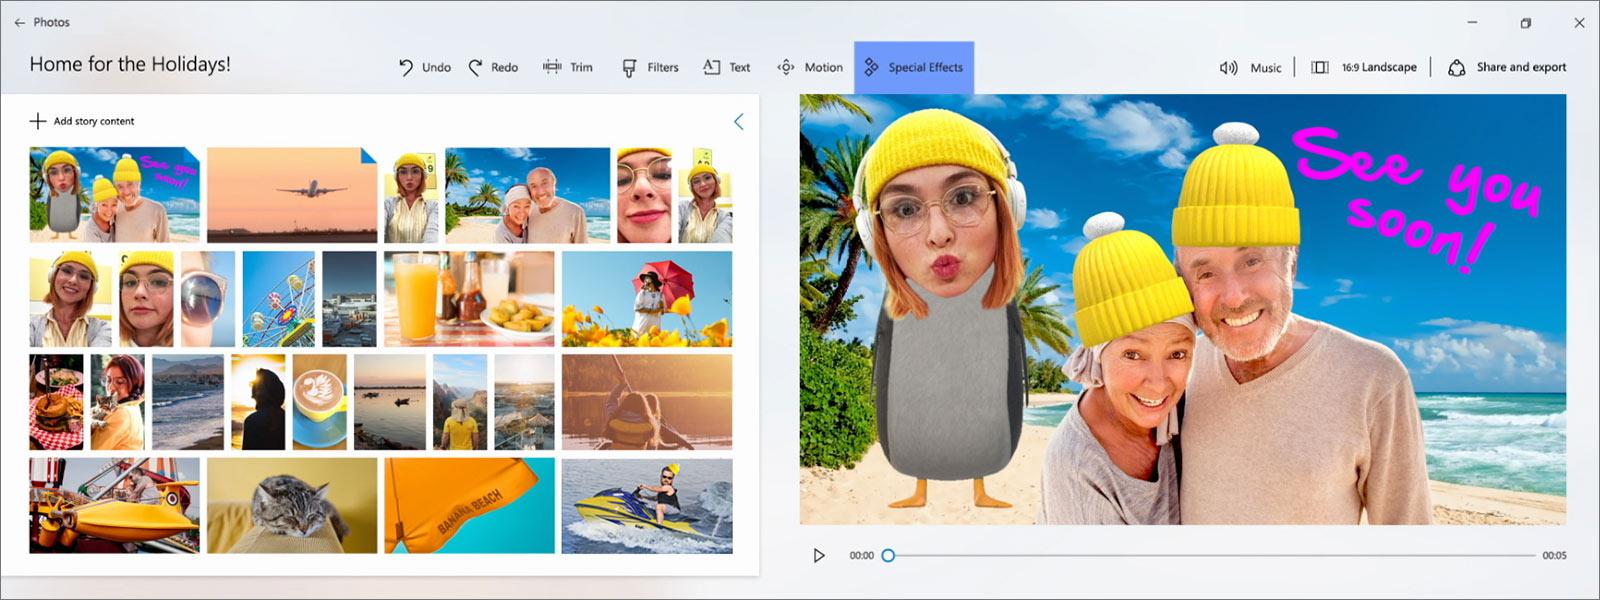 Windows 10 Photos app